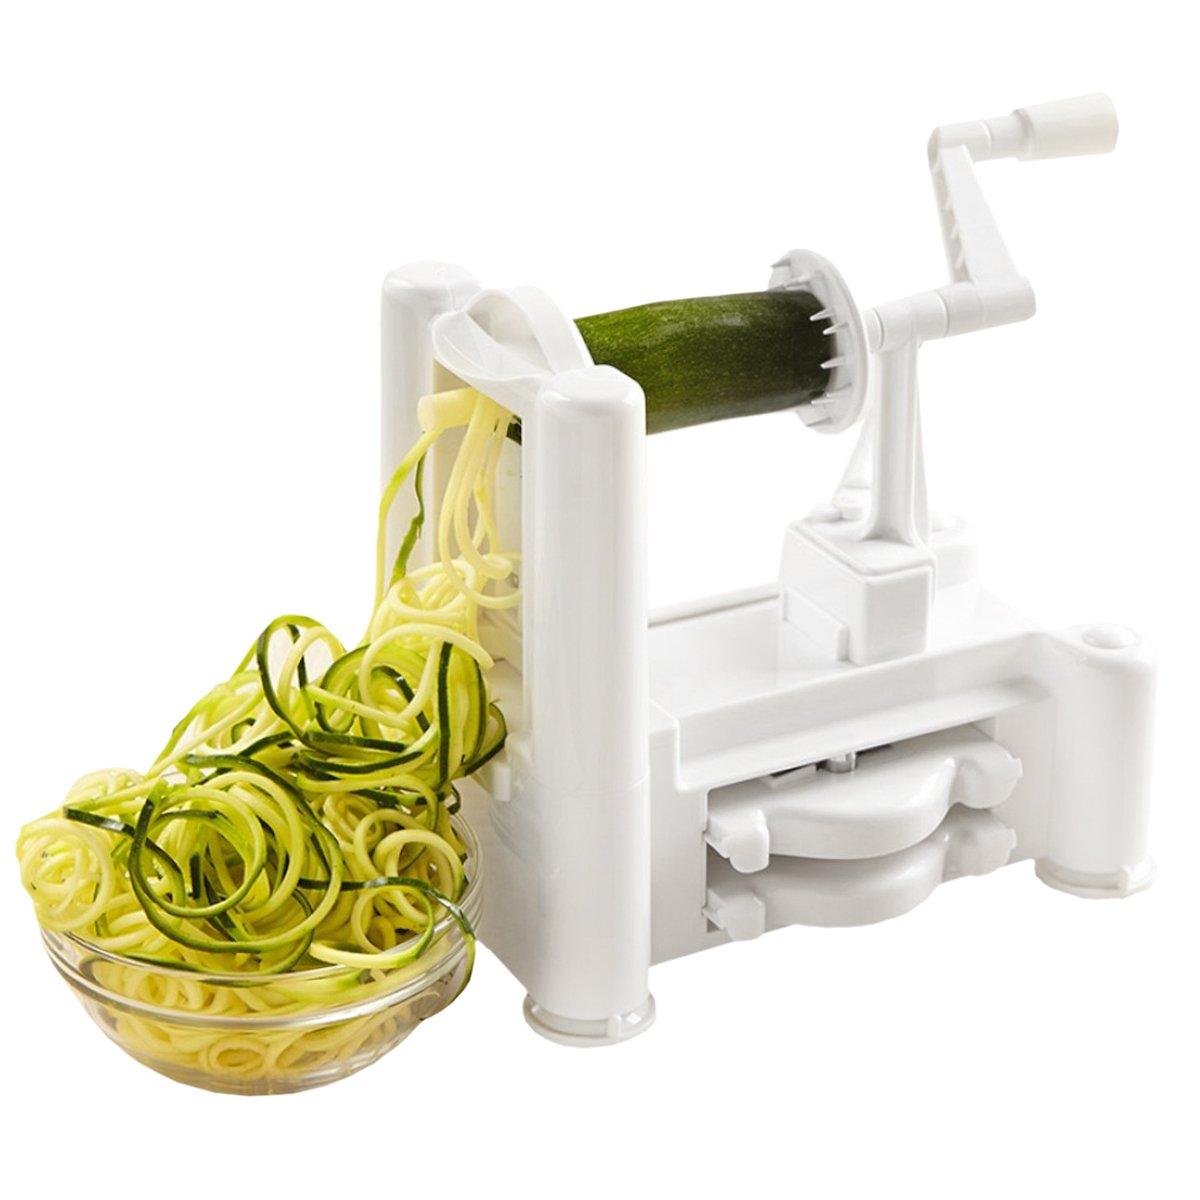 Kinzi Tri-Blade Vegetable and Fruit Spiralizer Spiral Slicer Chopper, Veggie Pasta Spaghetti Maker